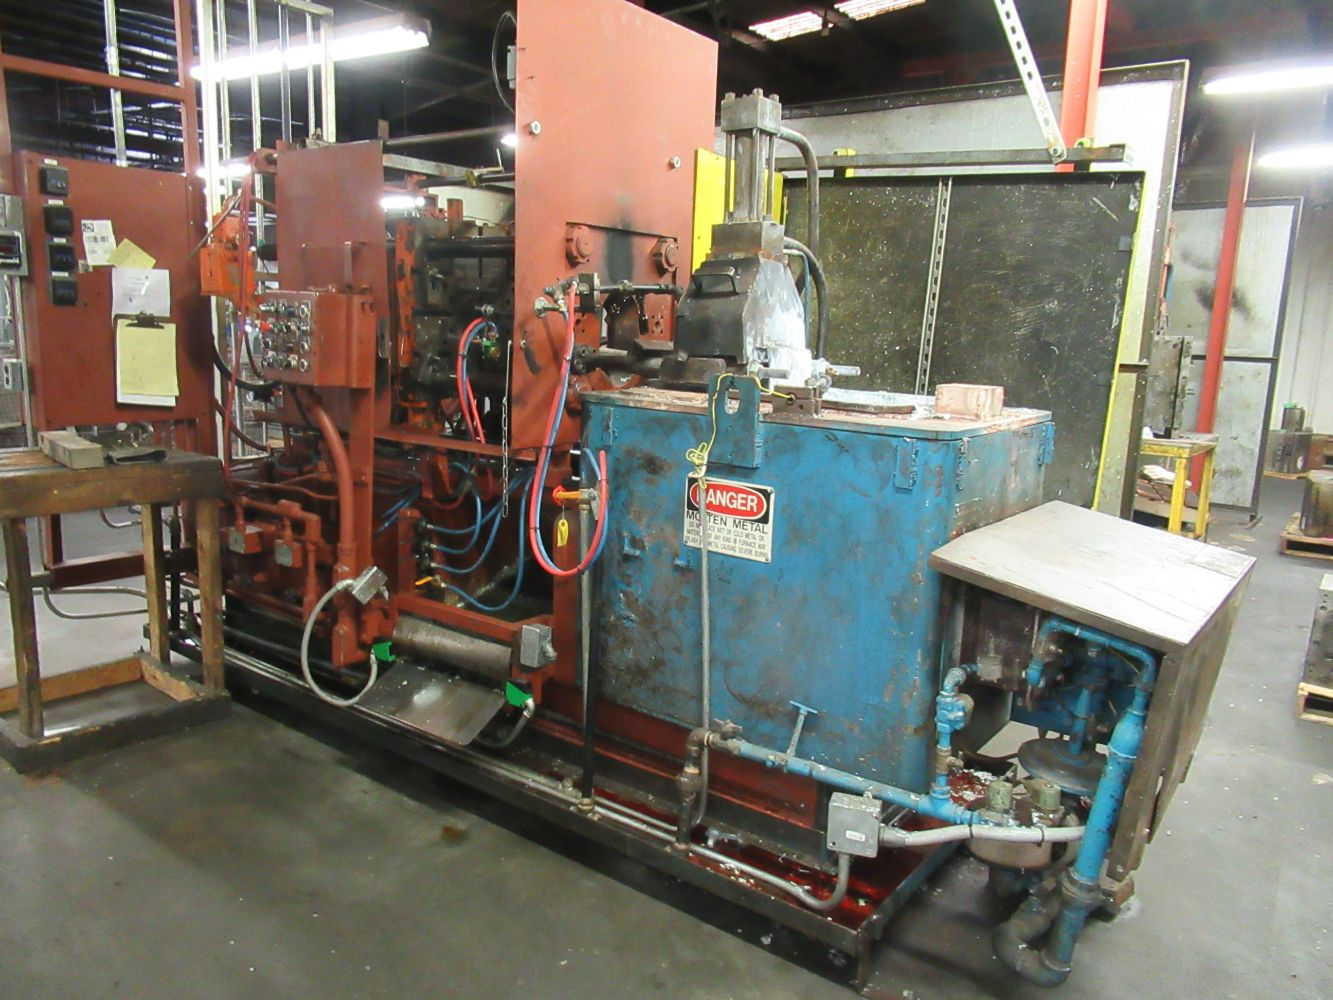 DURA-CAST, INC. - Zinc Diecast & Machining Facility